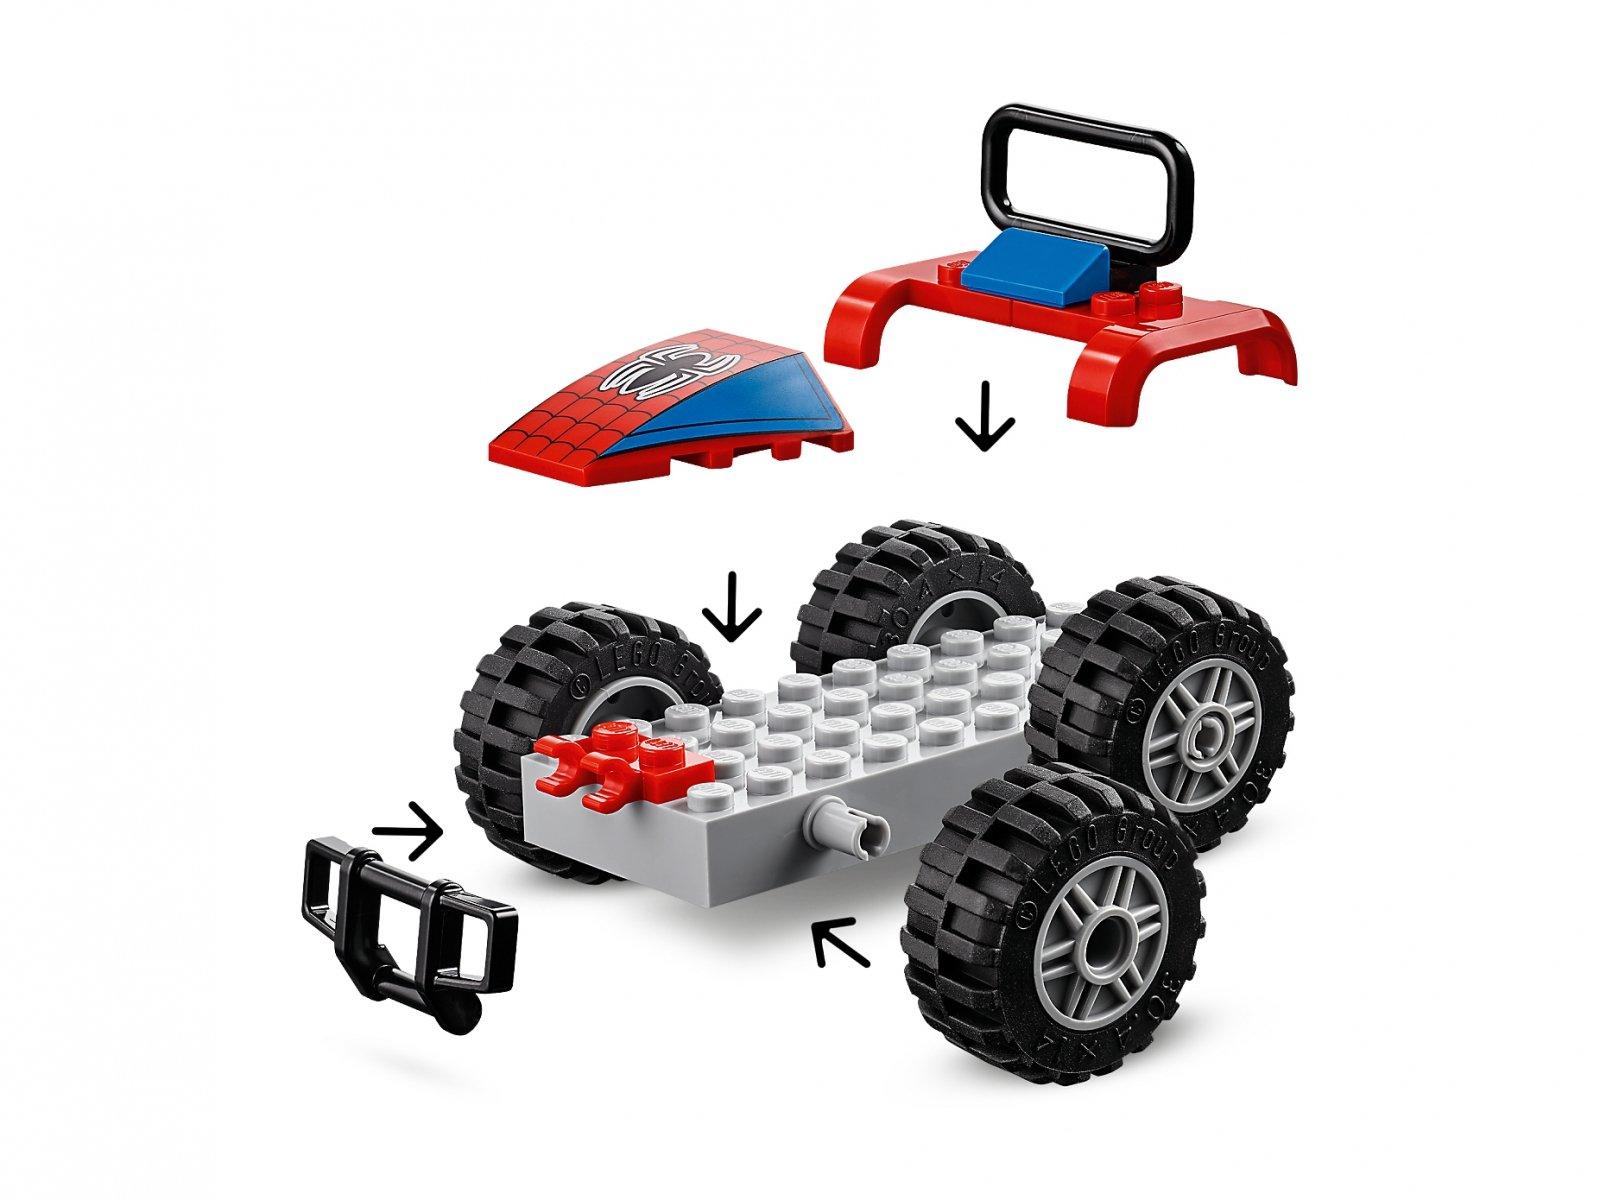 LEGO Marvel Super Heroes 76133 Pościg samochodowy Spider-Mana